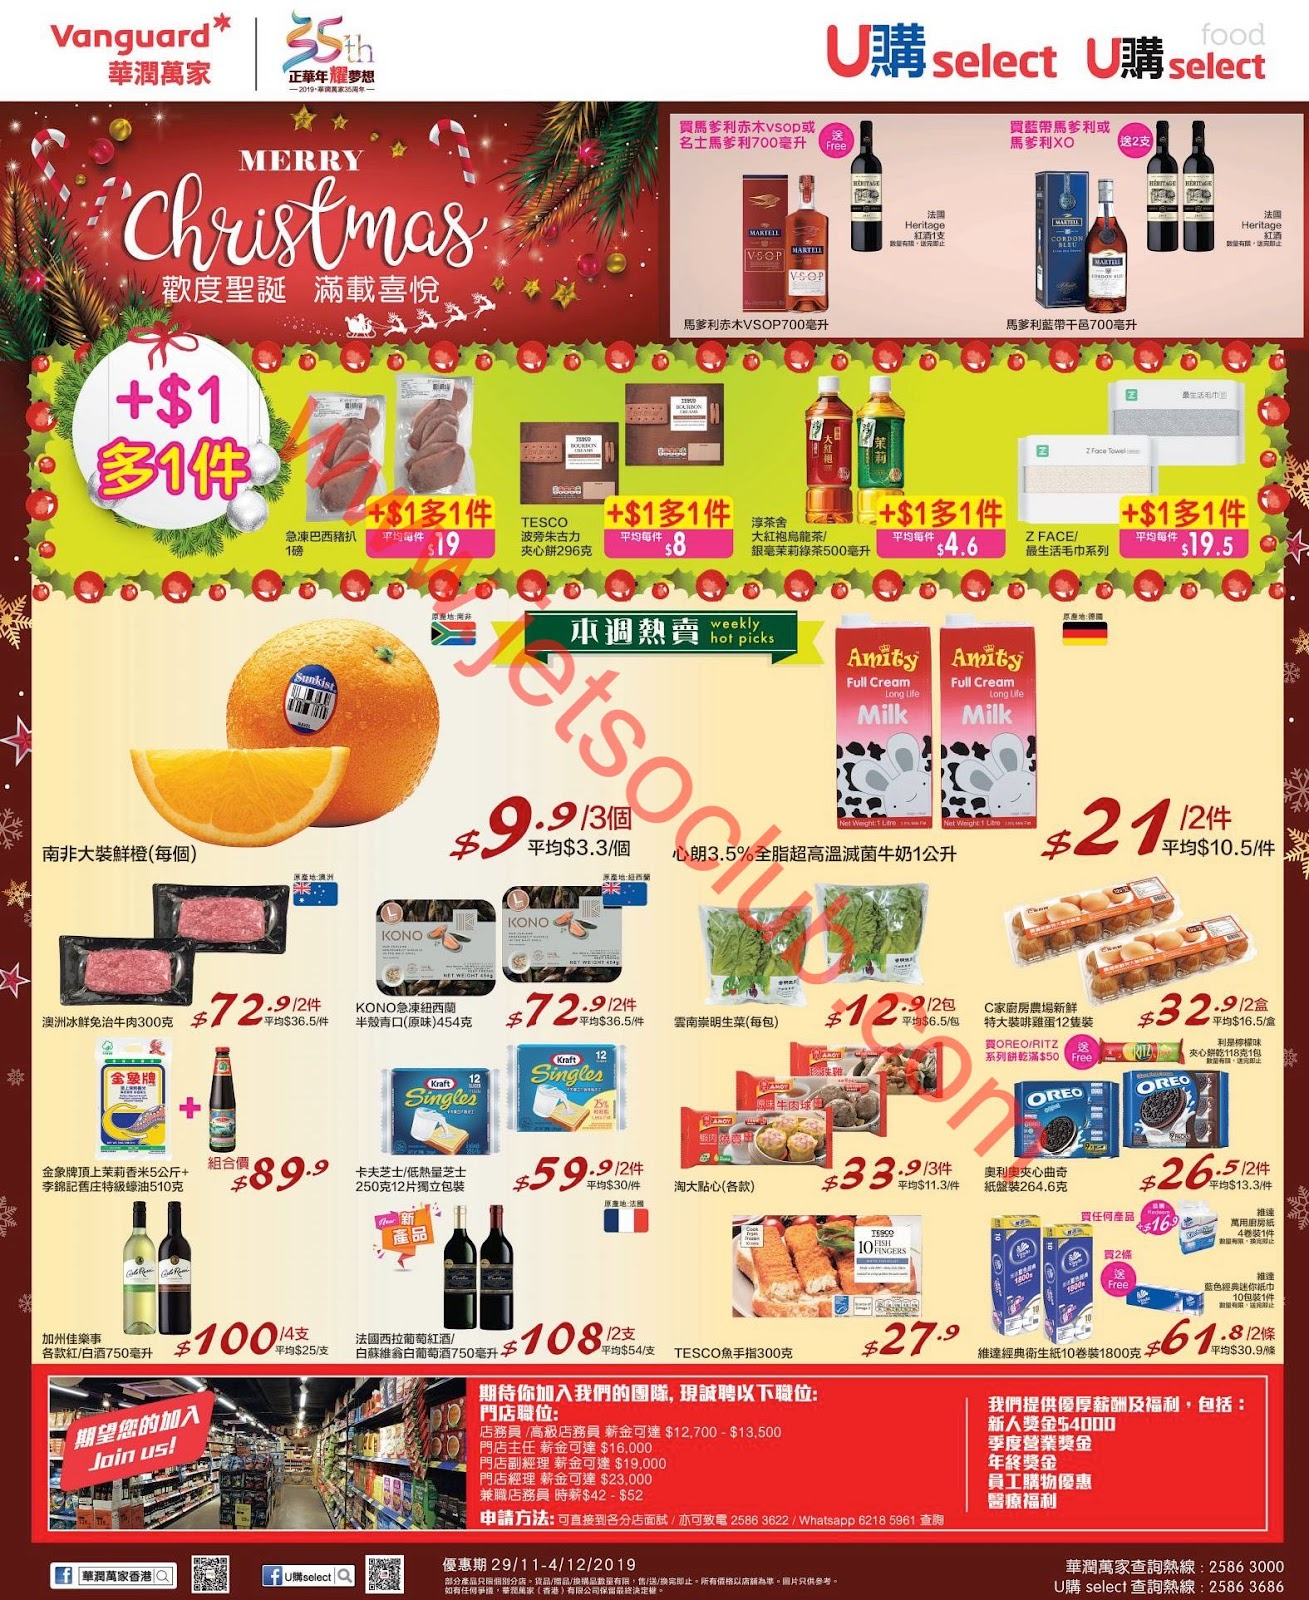 U購 select / 華潤萬家超級市場最新優惠(29/11) ( Jetso Club 著數俱樂部 )